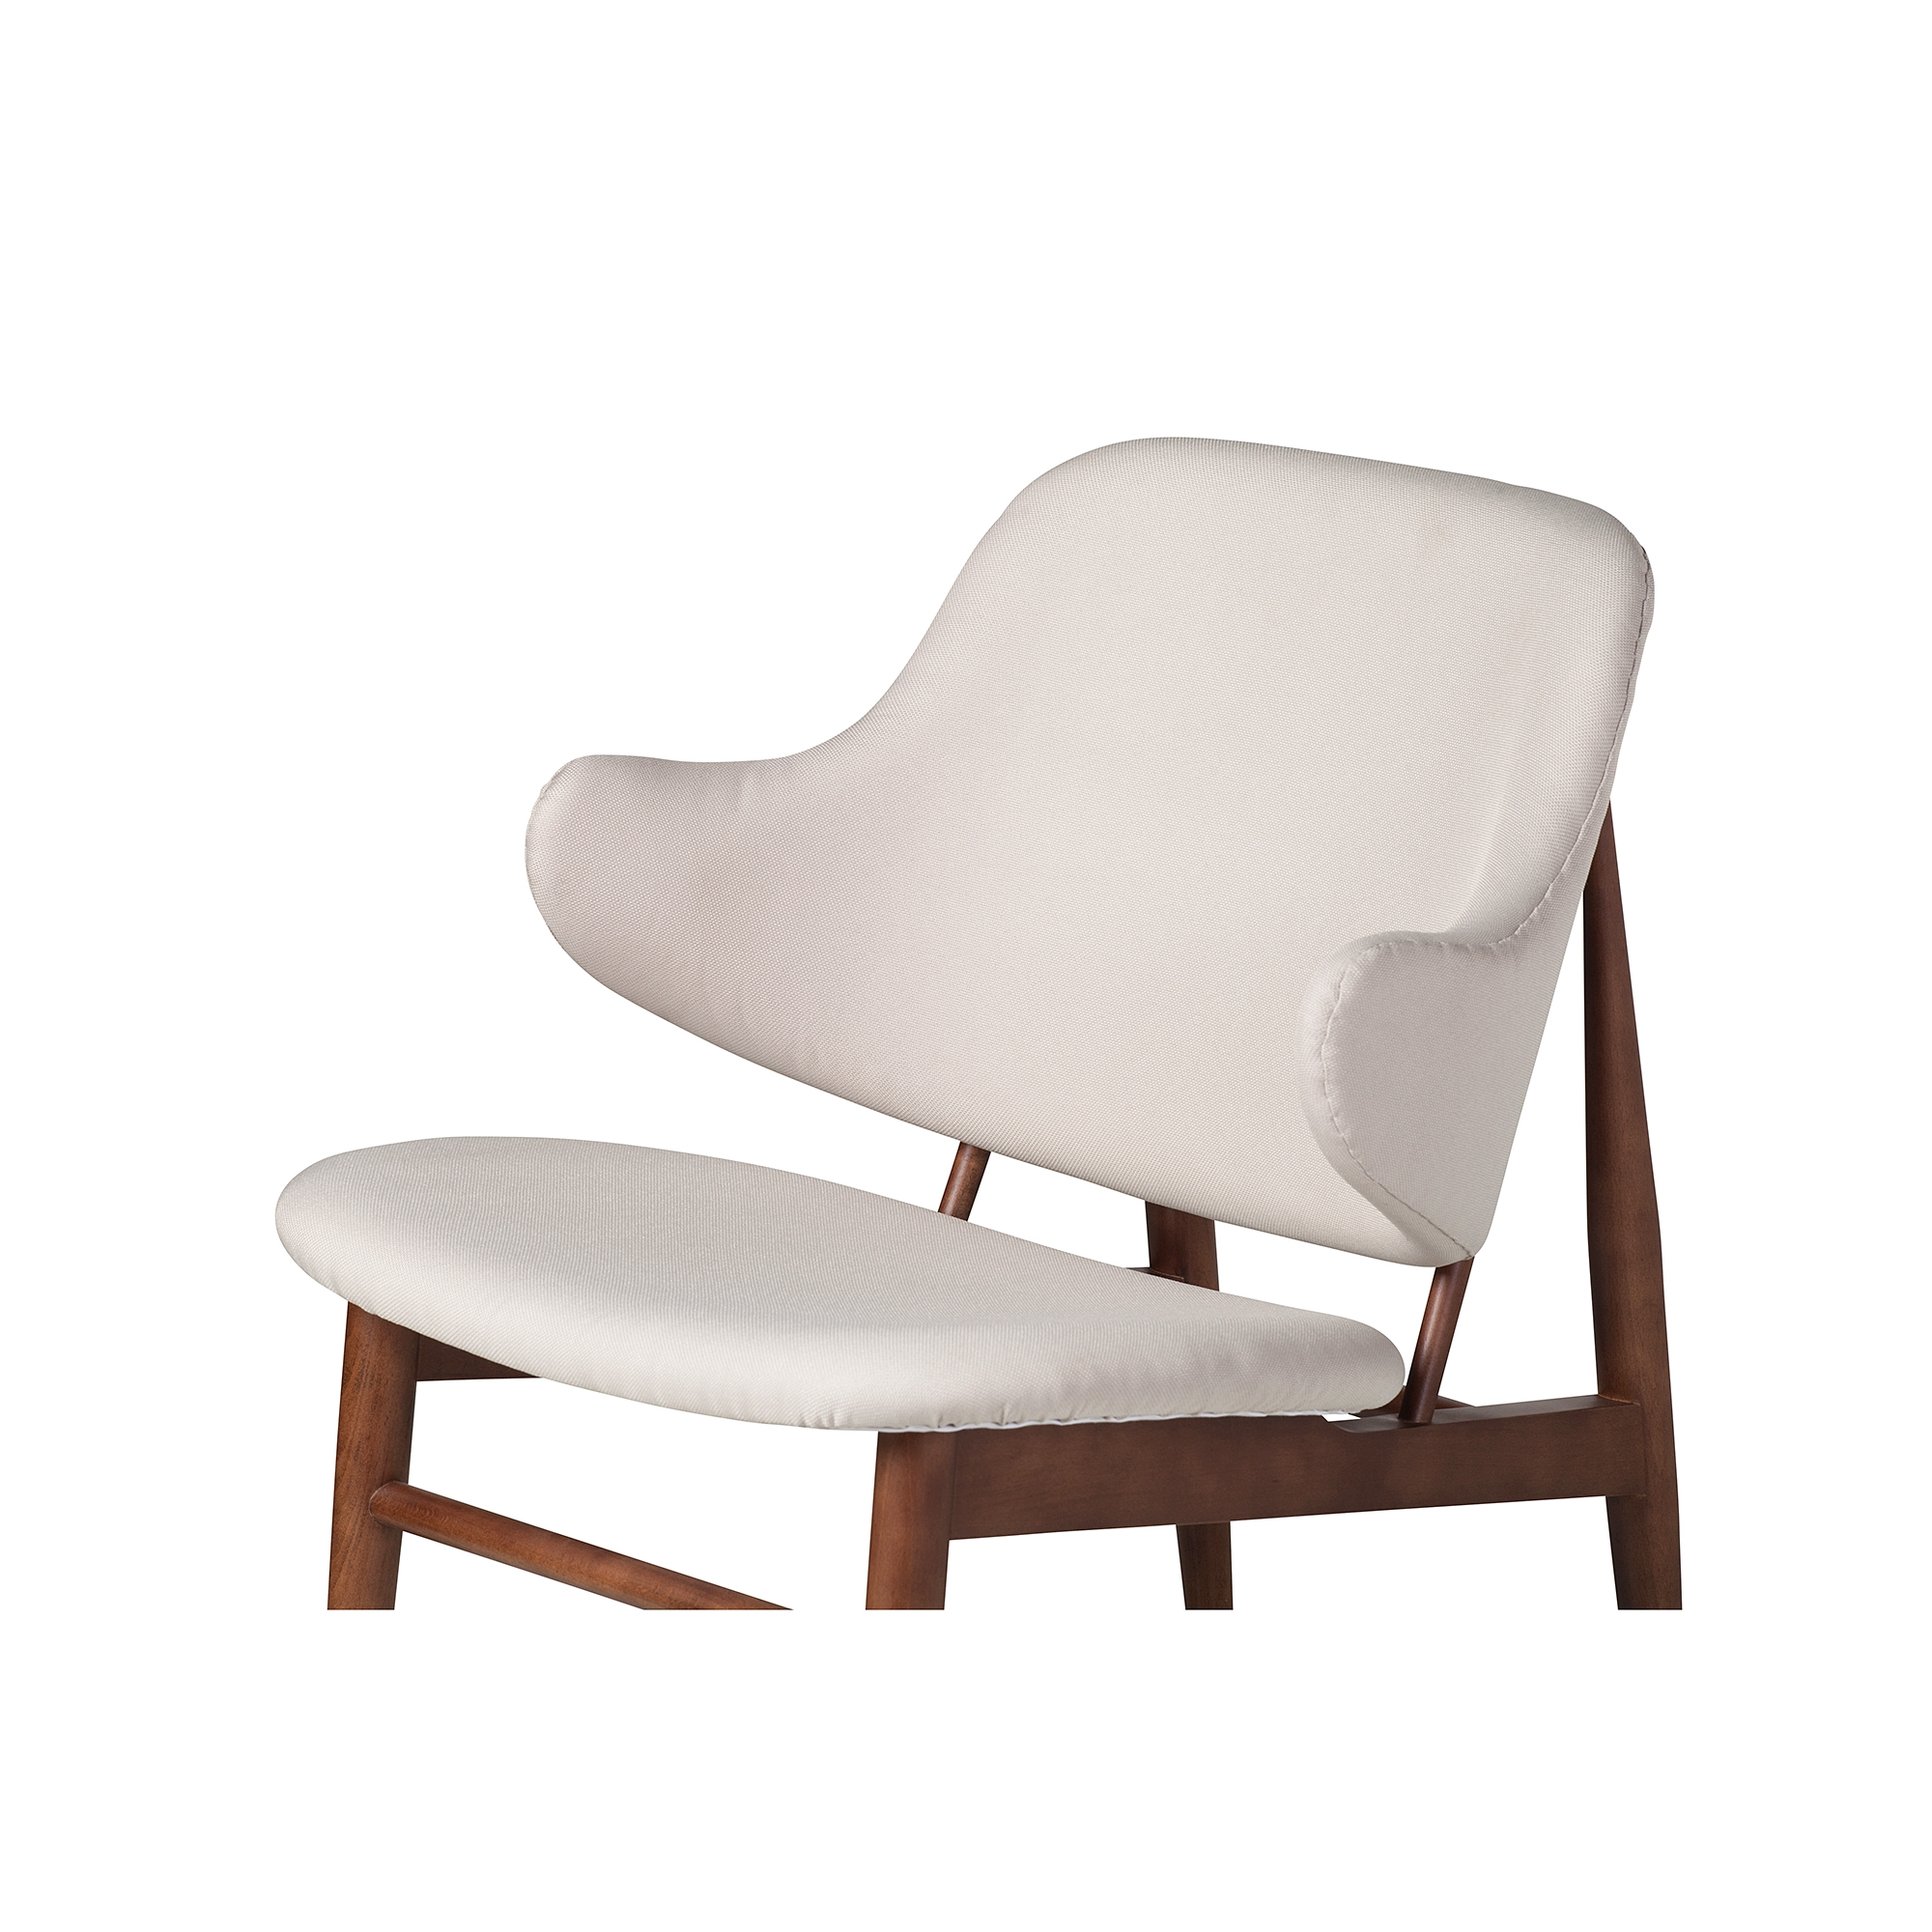 Super Romi Wood Lounge Chair In White European Linen Alphanode Cool Chair Designs And Ideas Alphanodeonline